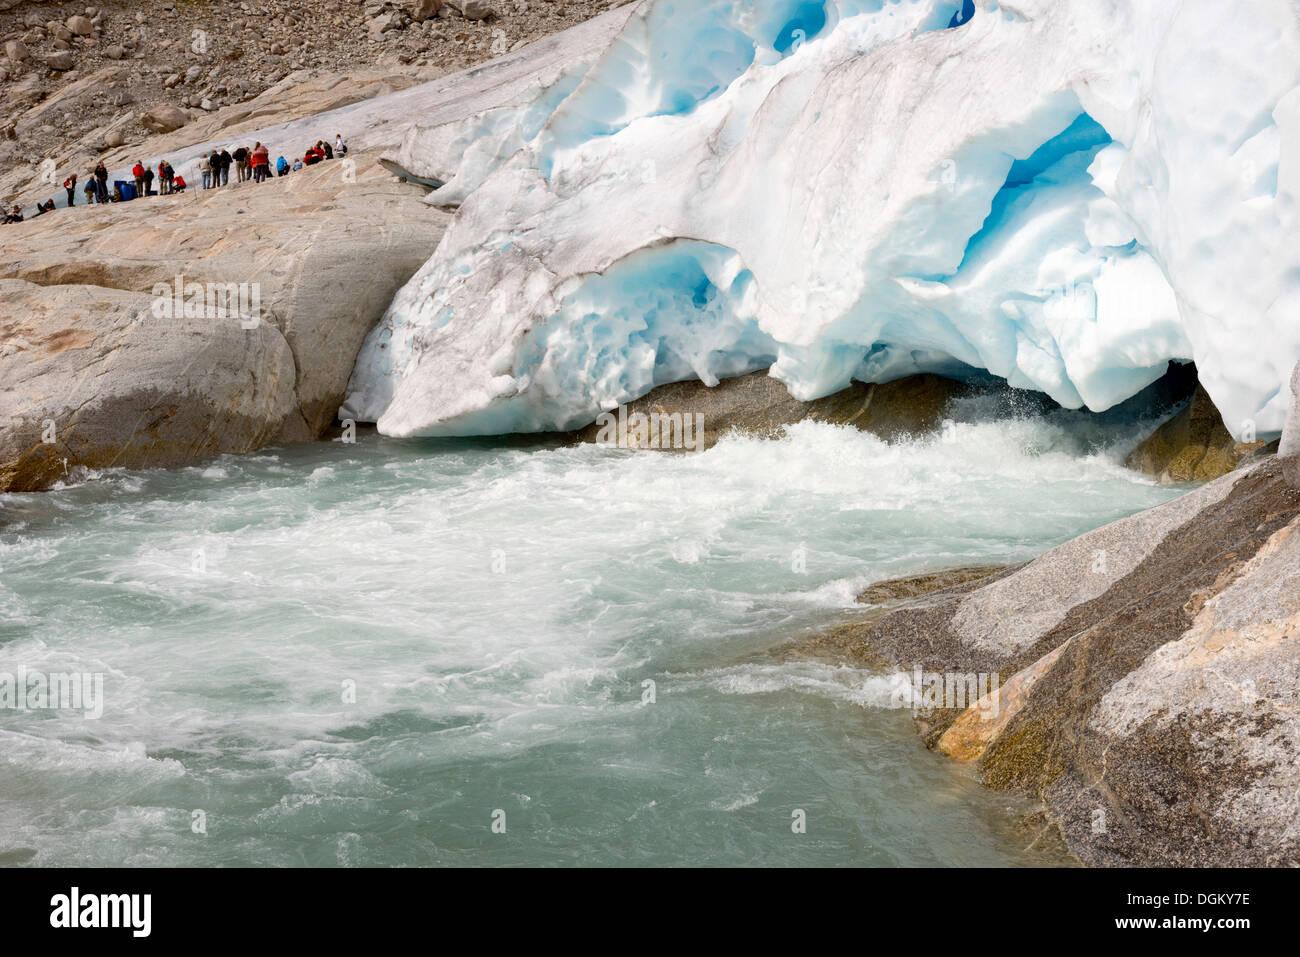 Blue ice and runoff of the glacier tongue of Nigardsbreen Glacier, Jostedal, Gletscher Jostedalsbreen, Sogn og Fjordane - Stock Image